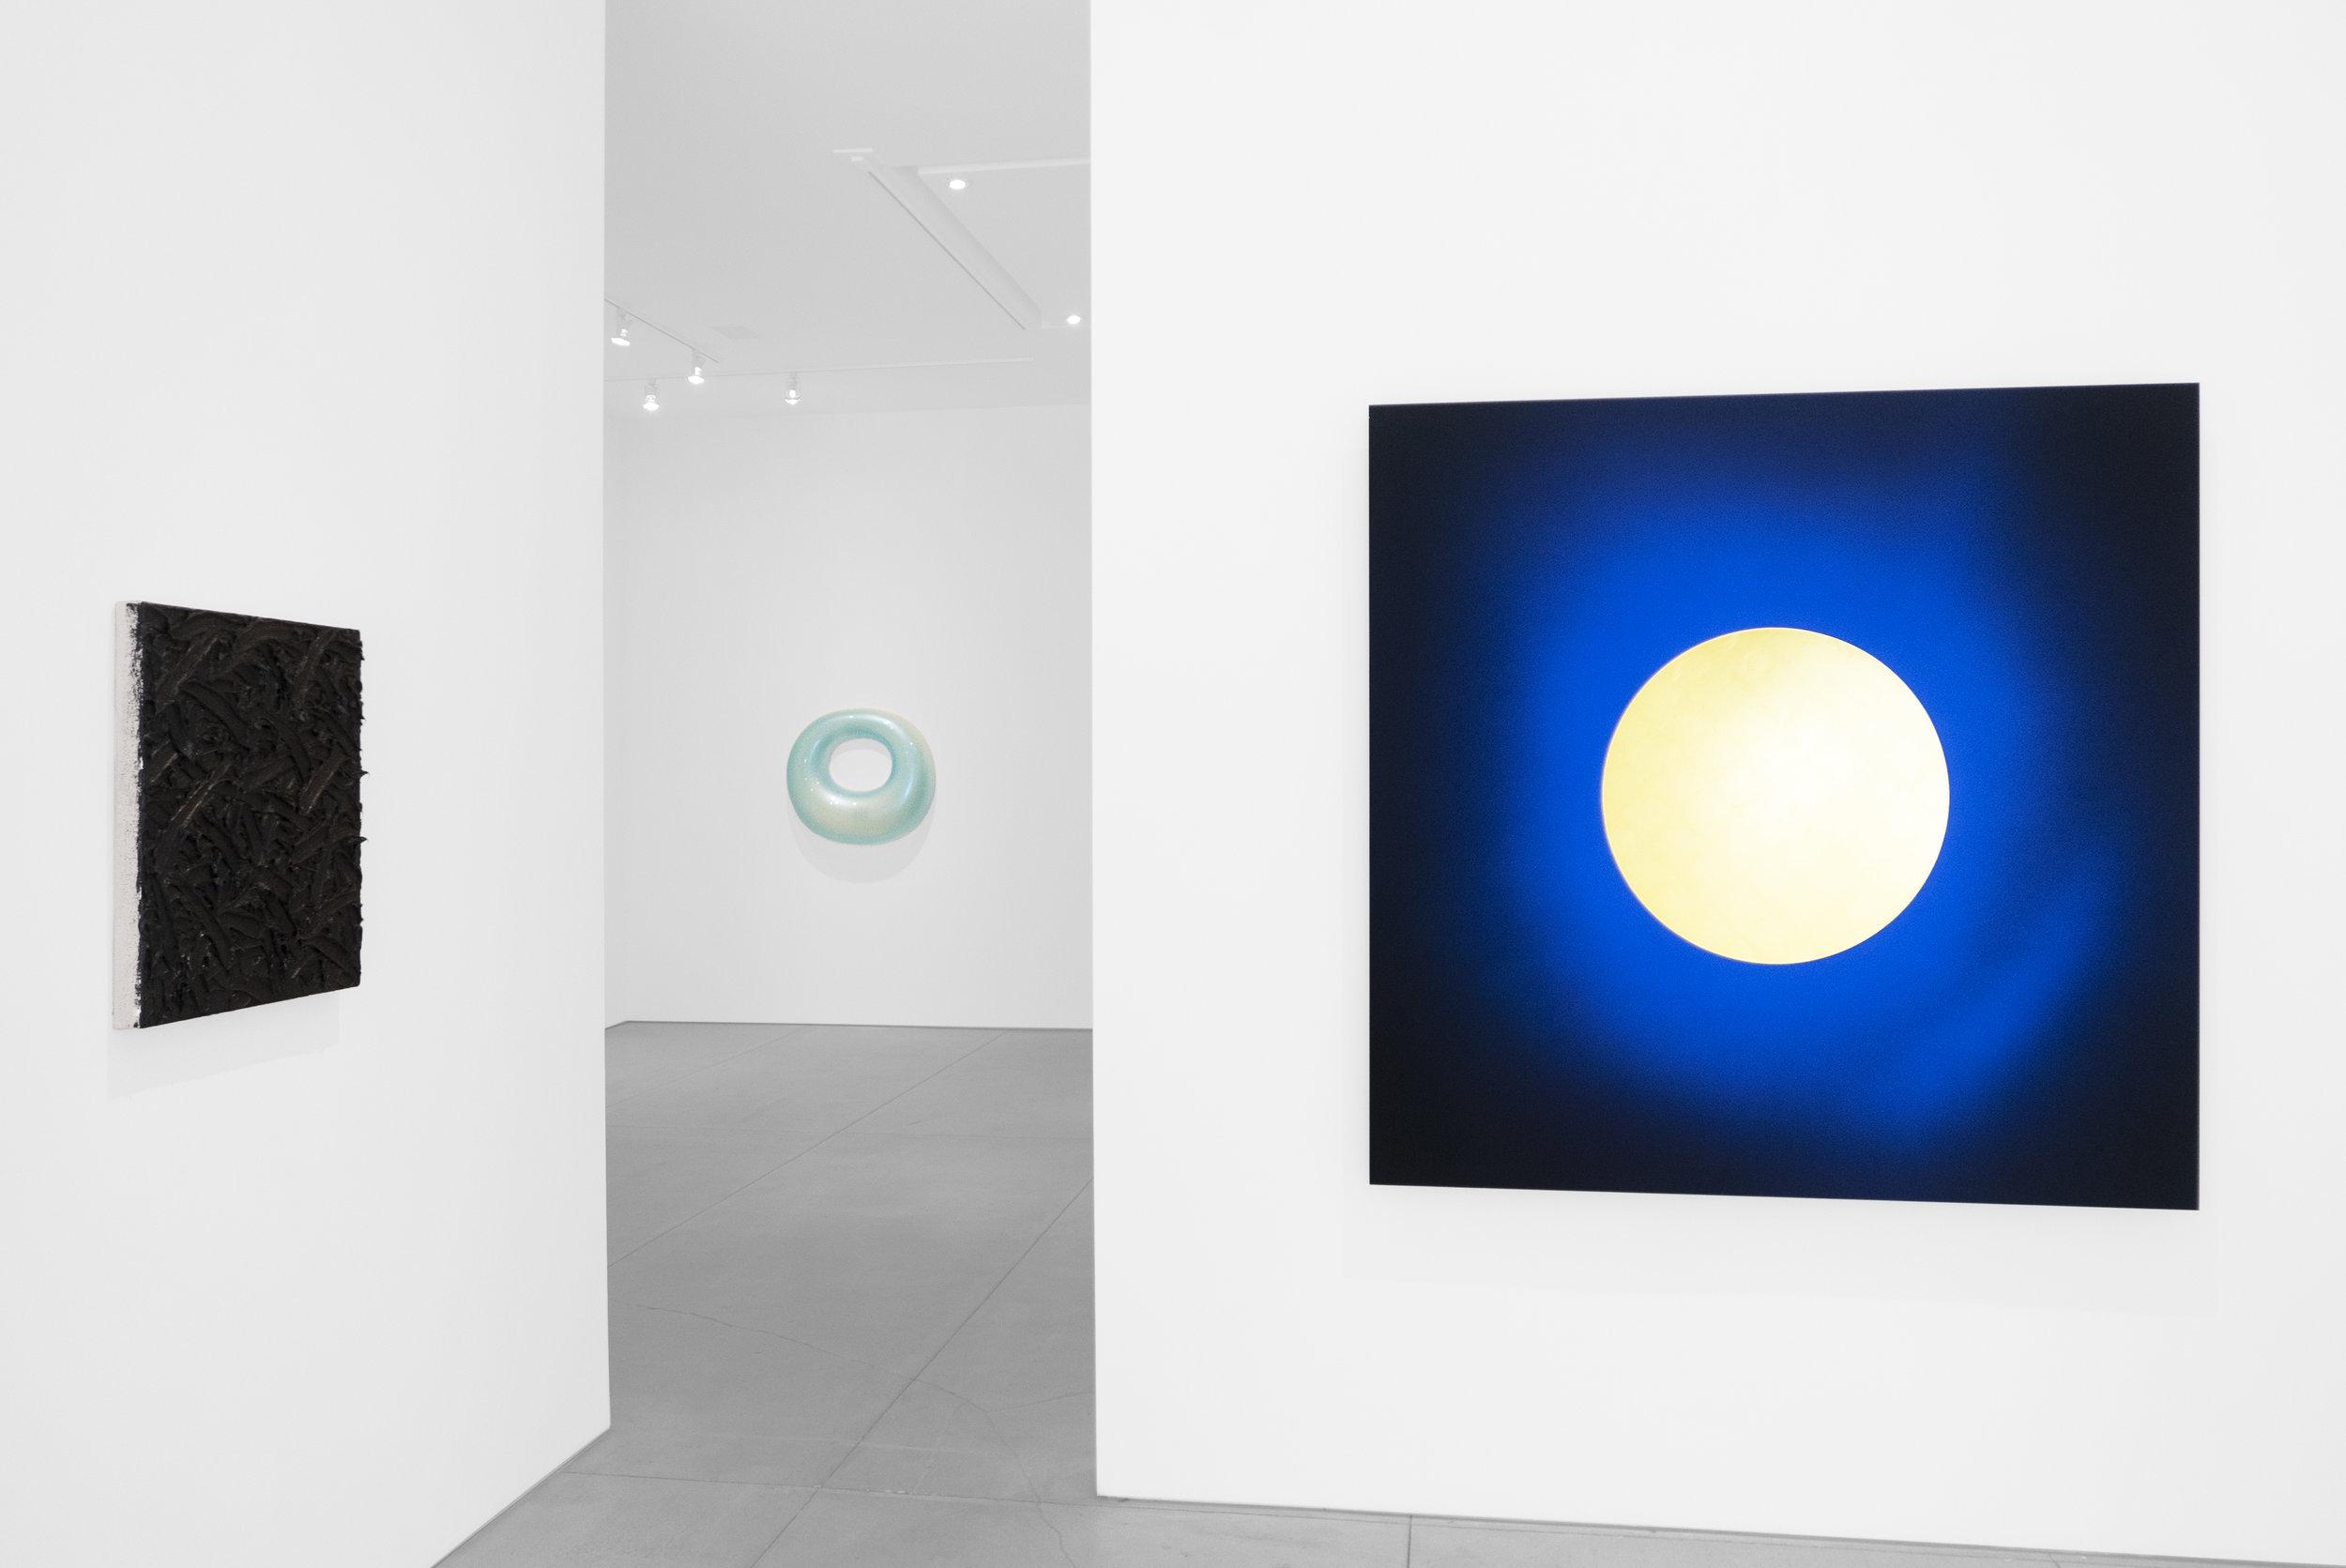 25 Years_Peter Blake Gallery_2019_Installation View_10.jpg